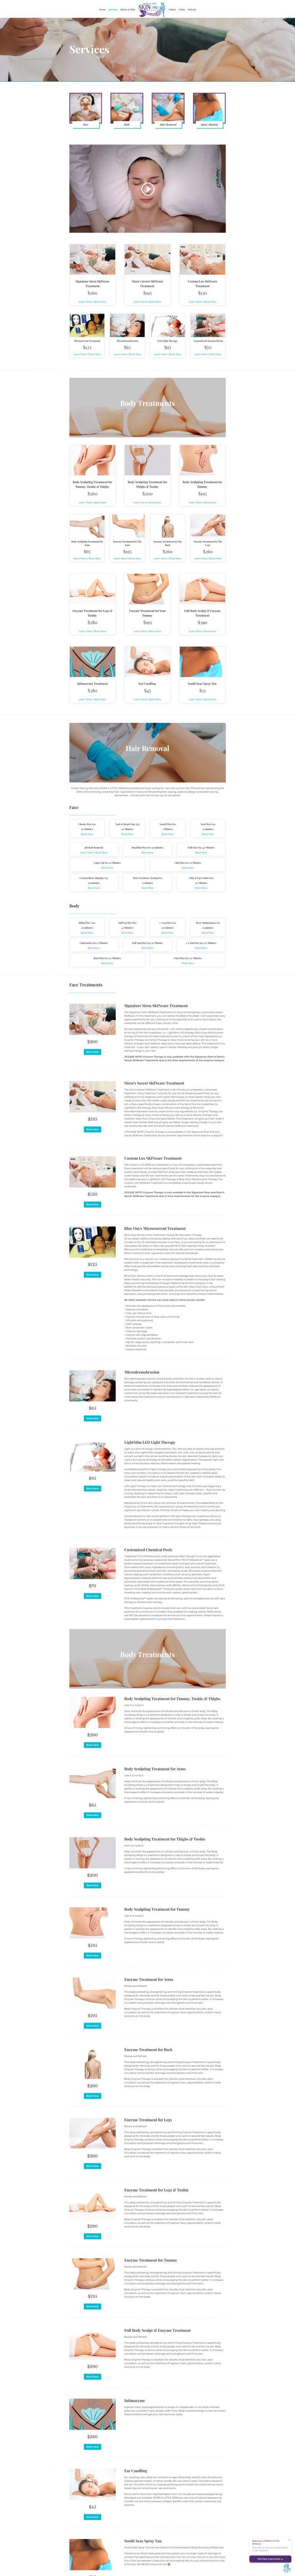 skincare web design services page